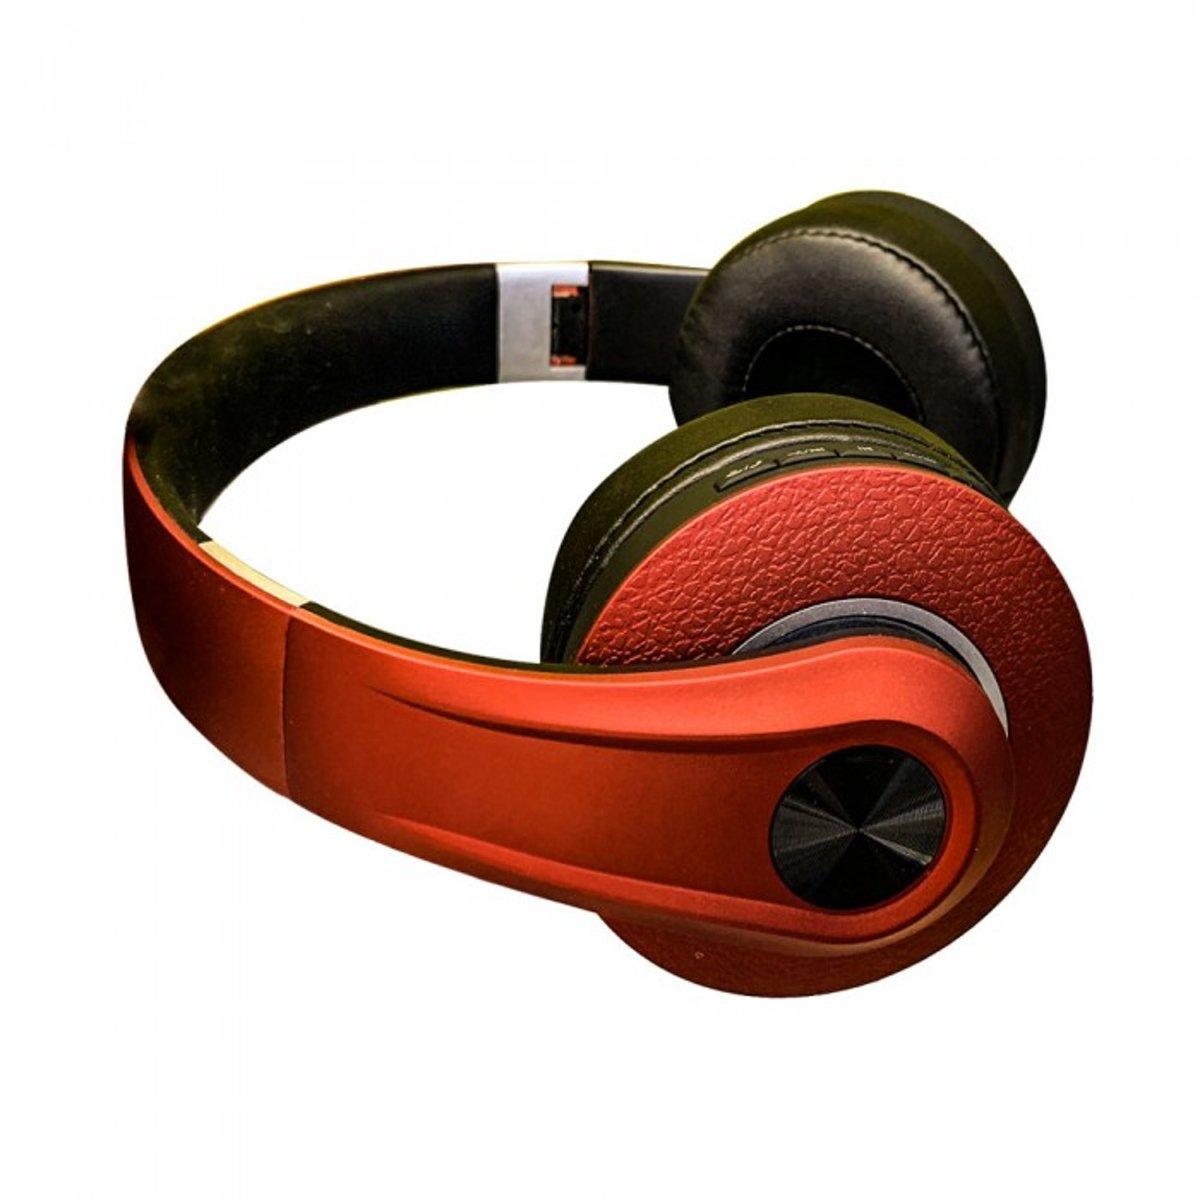 V-tac VT-6322 Bluetooth draadloze koptelefoon - verstelbaar - rood